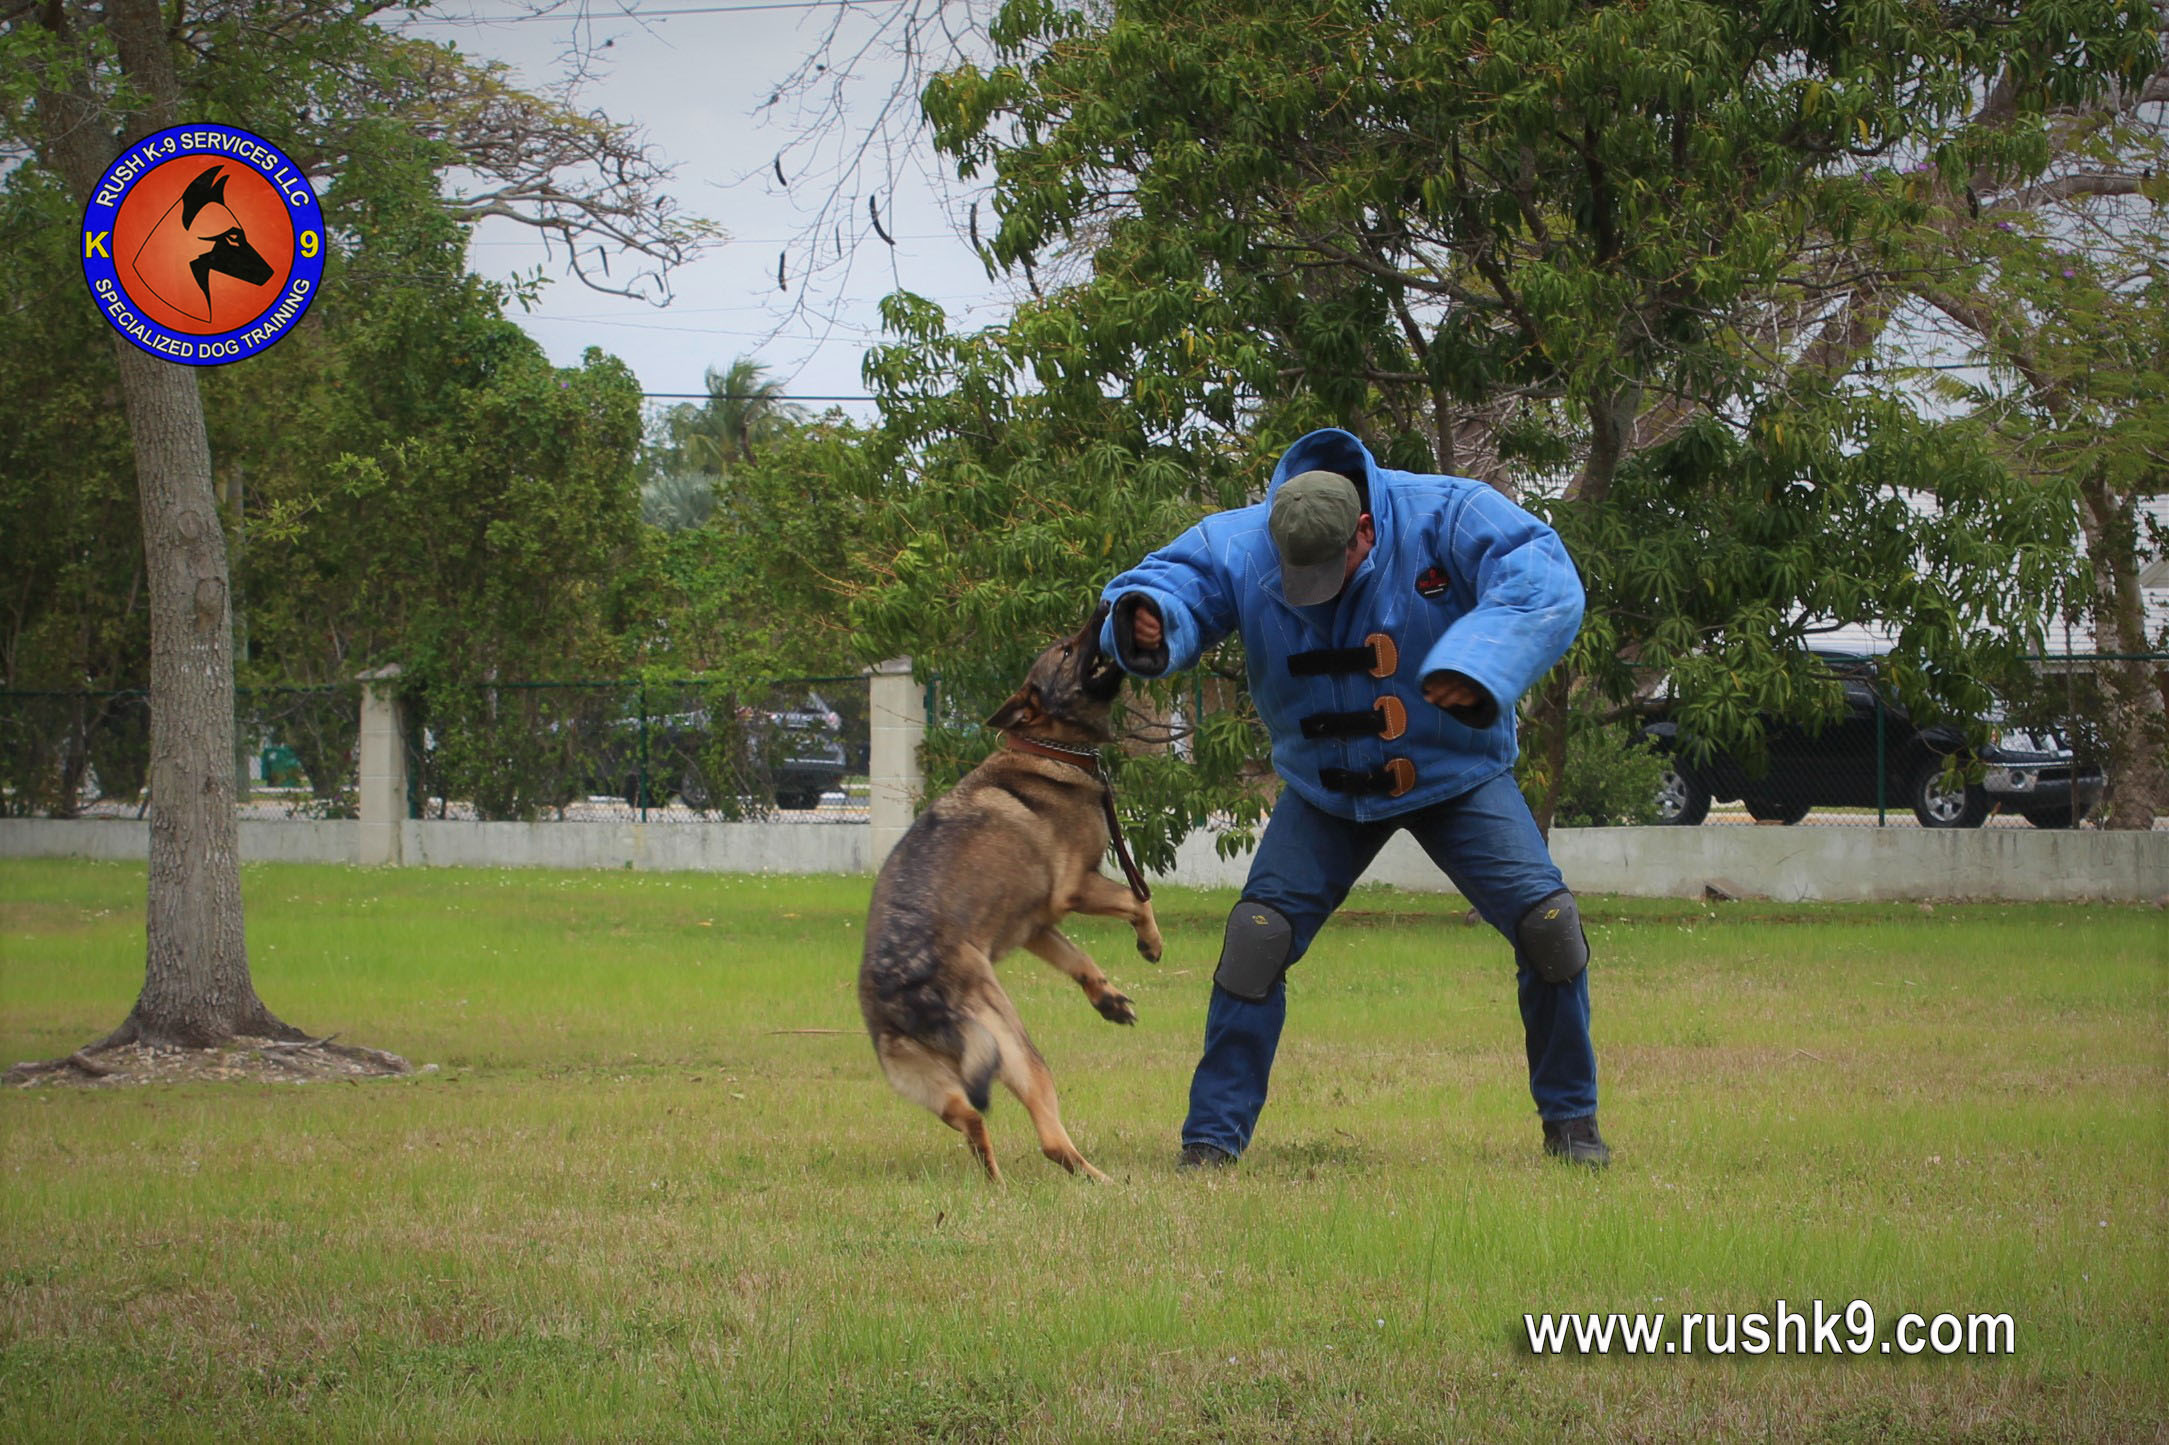 rush k9 services (26)